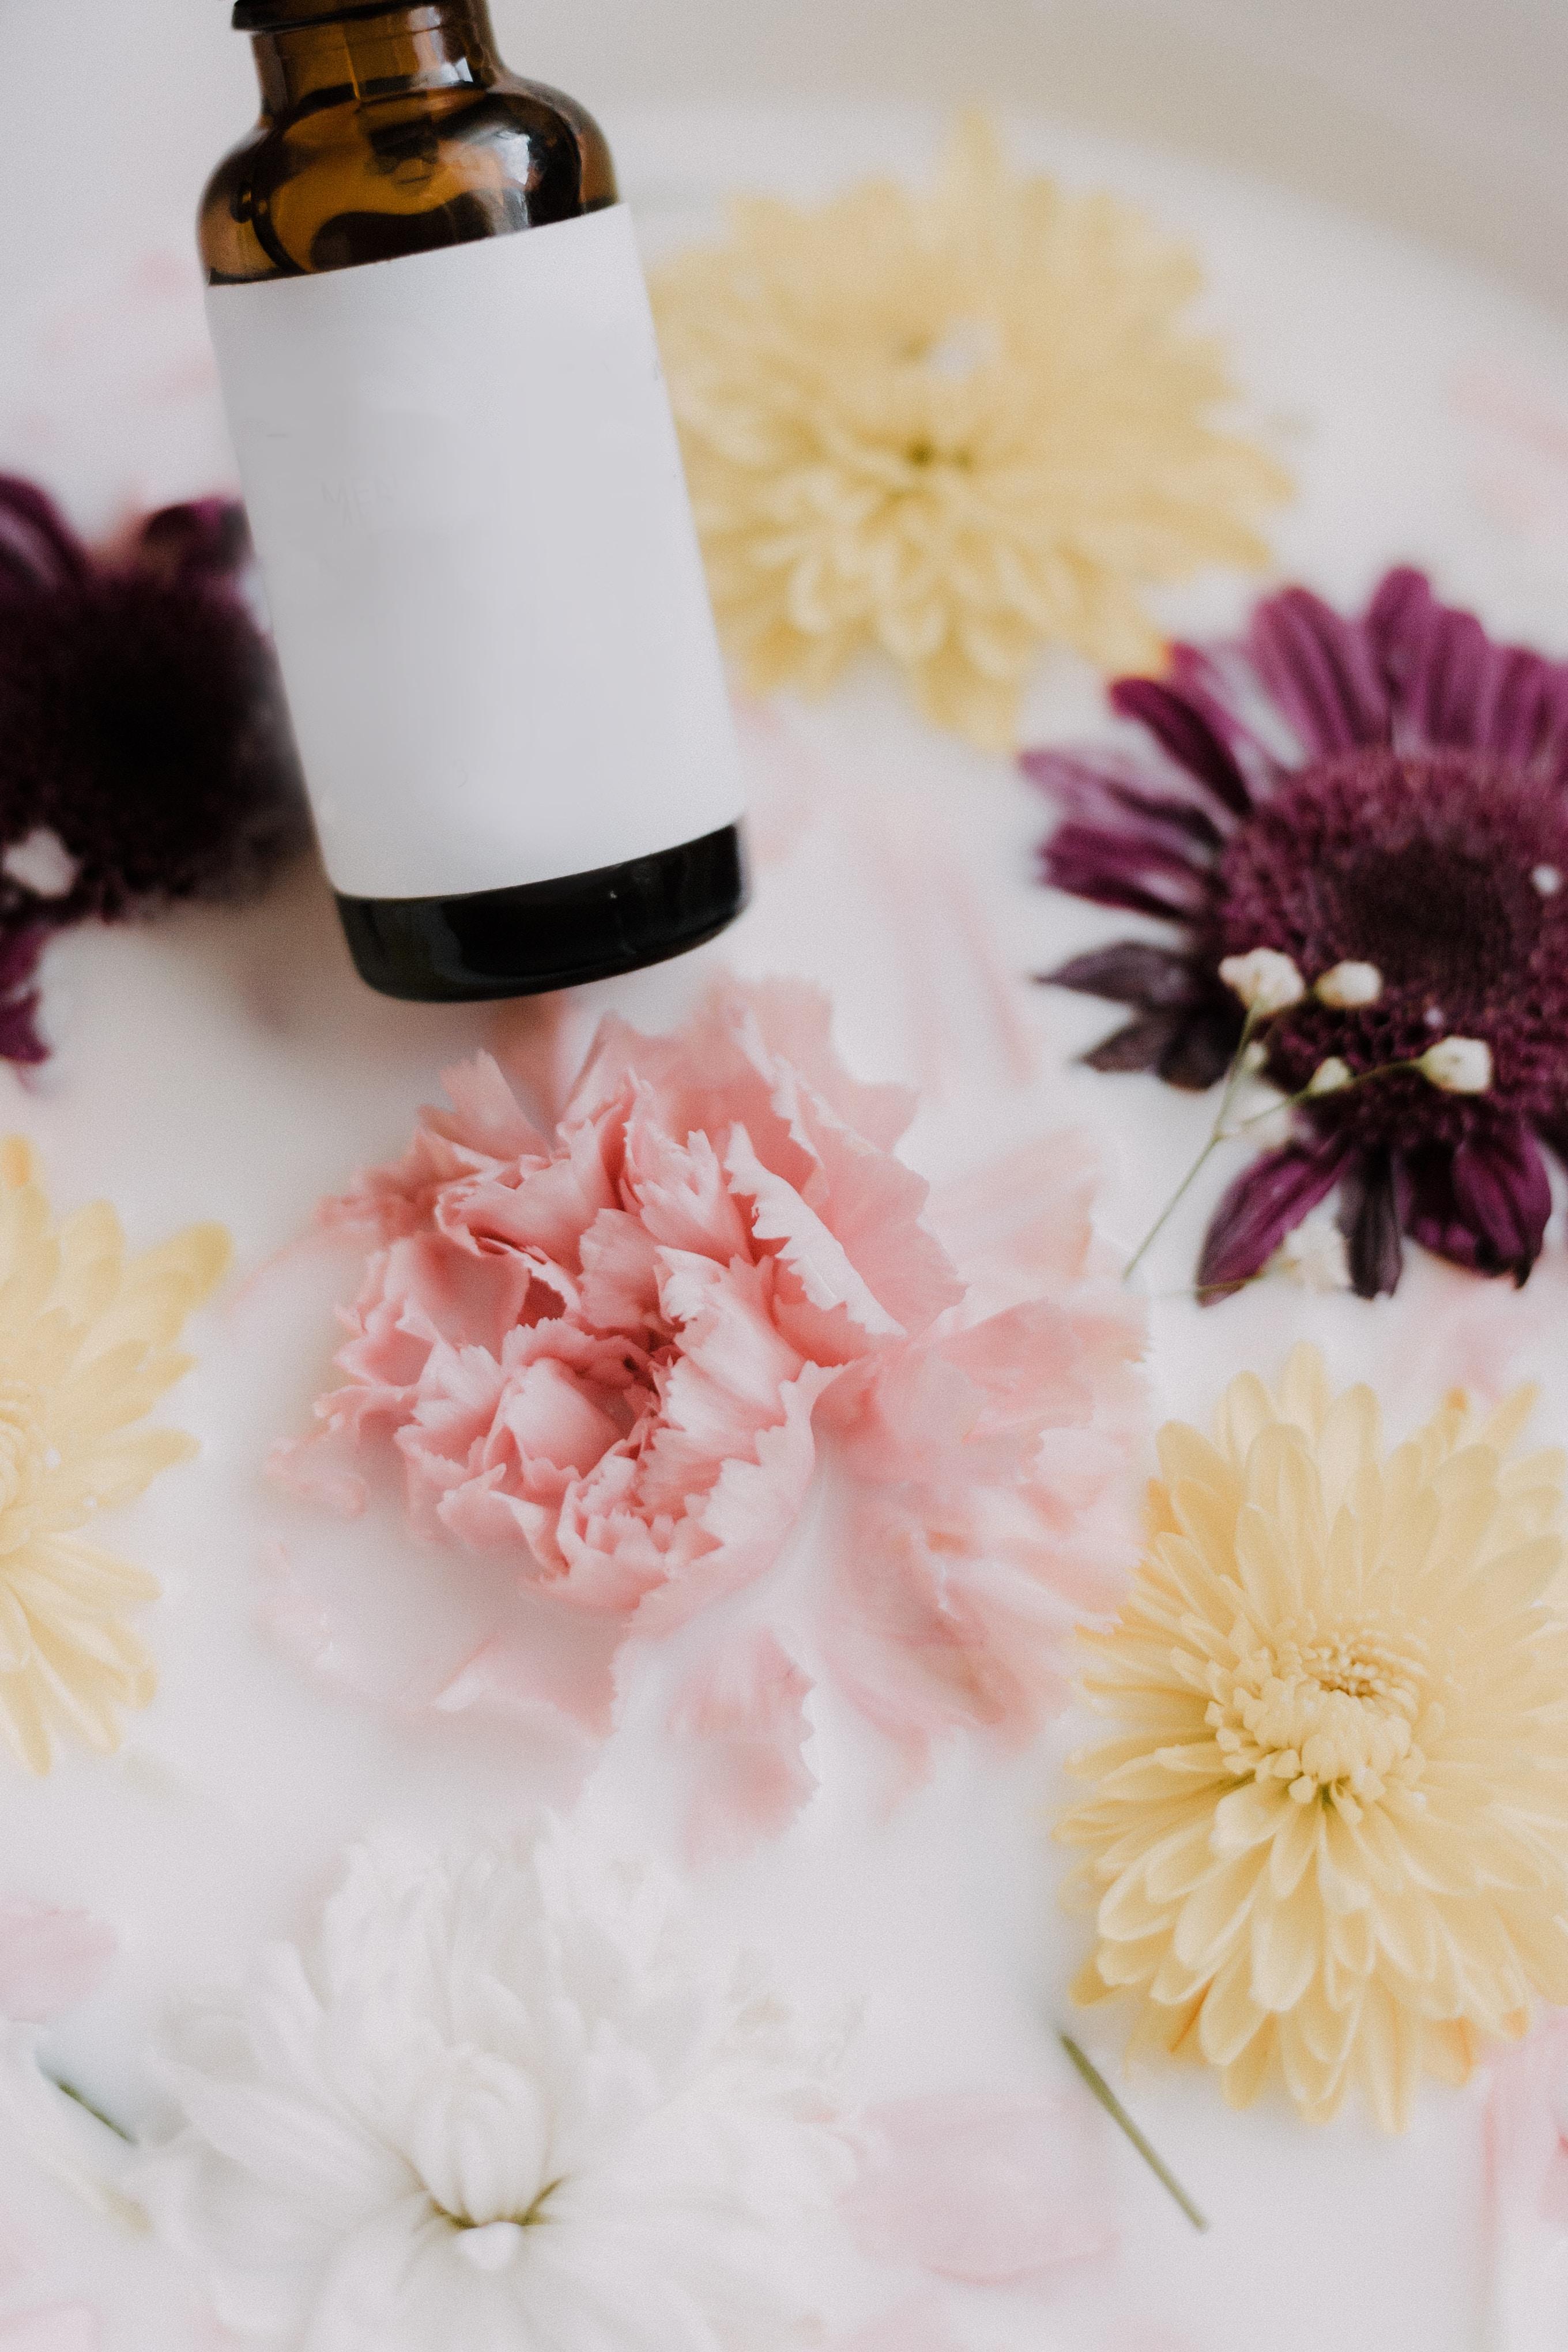 Parfüm rituálé